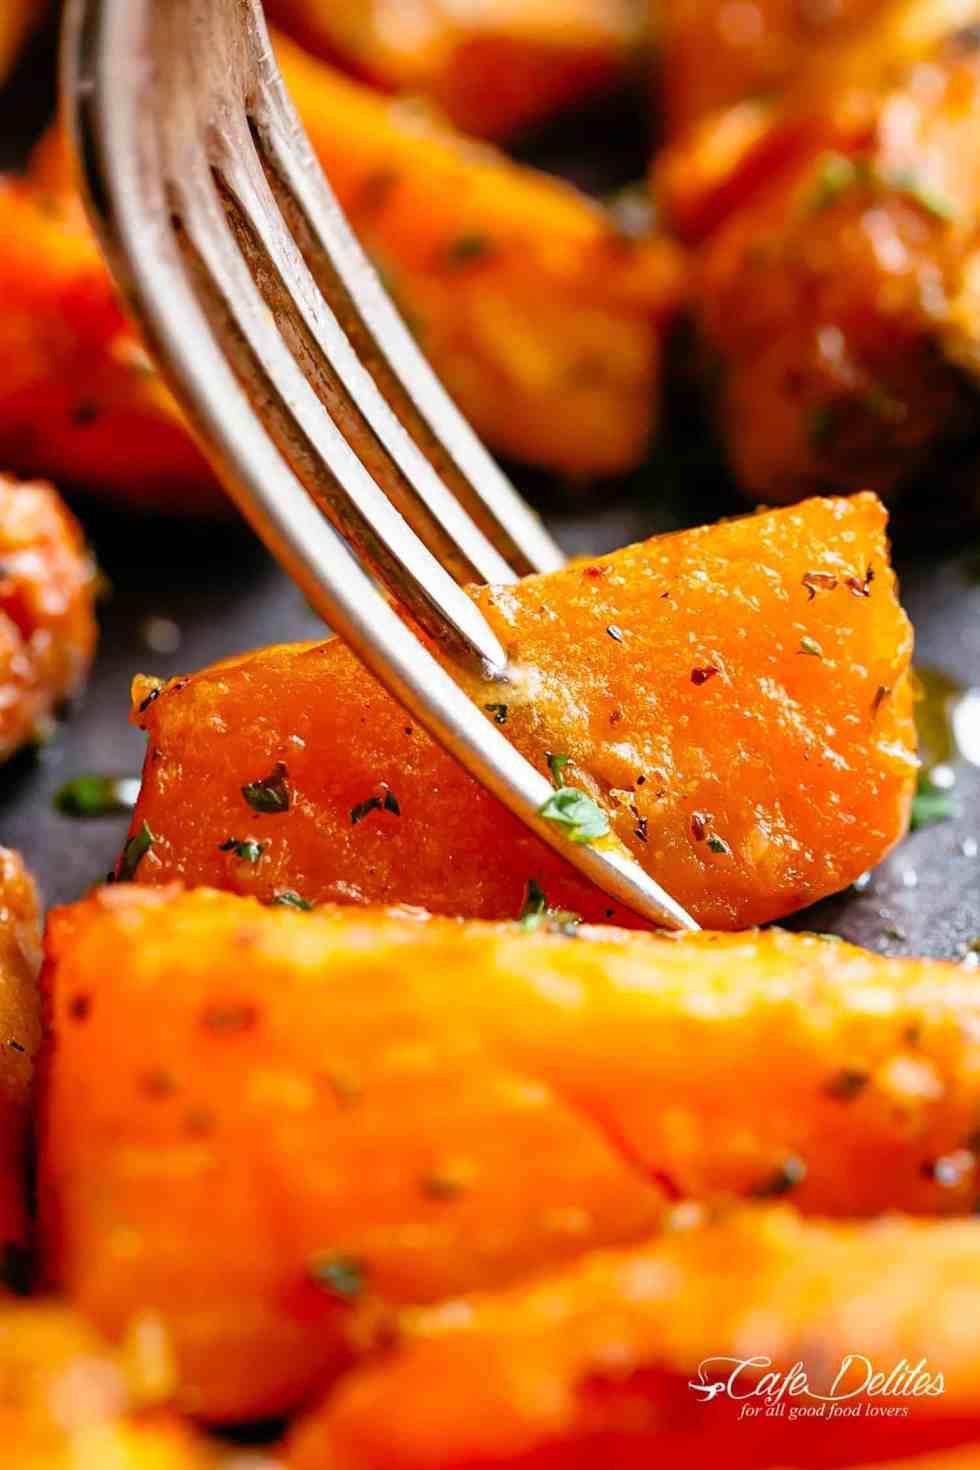 Easting Roasted Sweet Potatoes